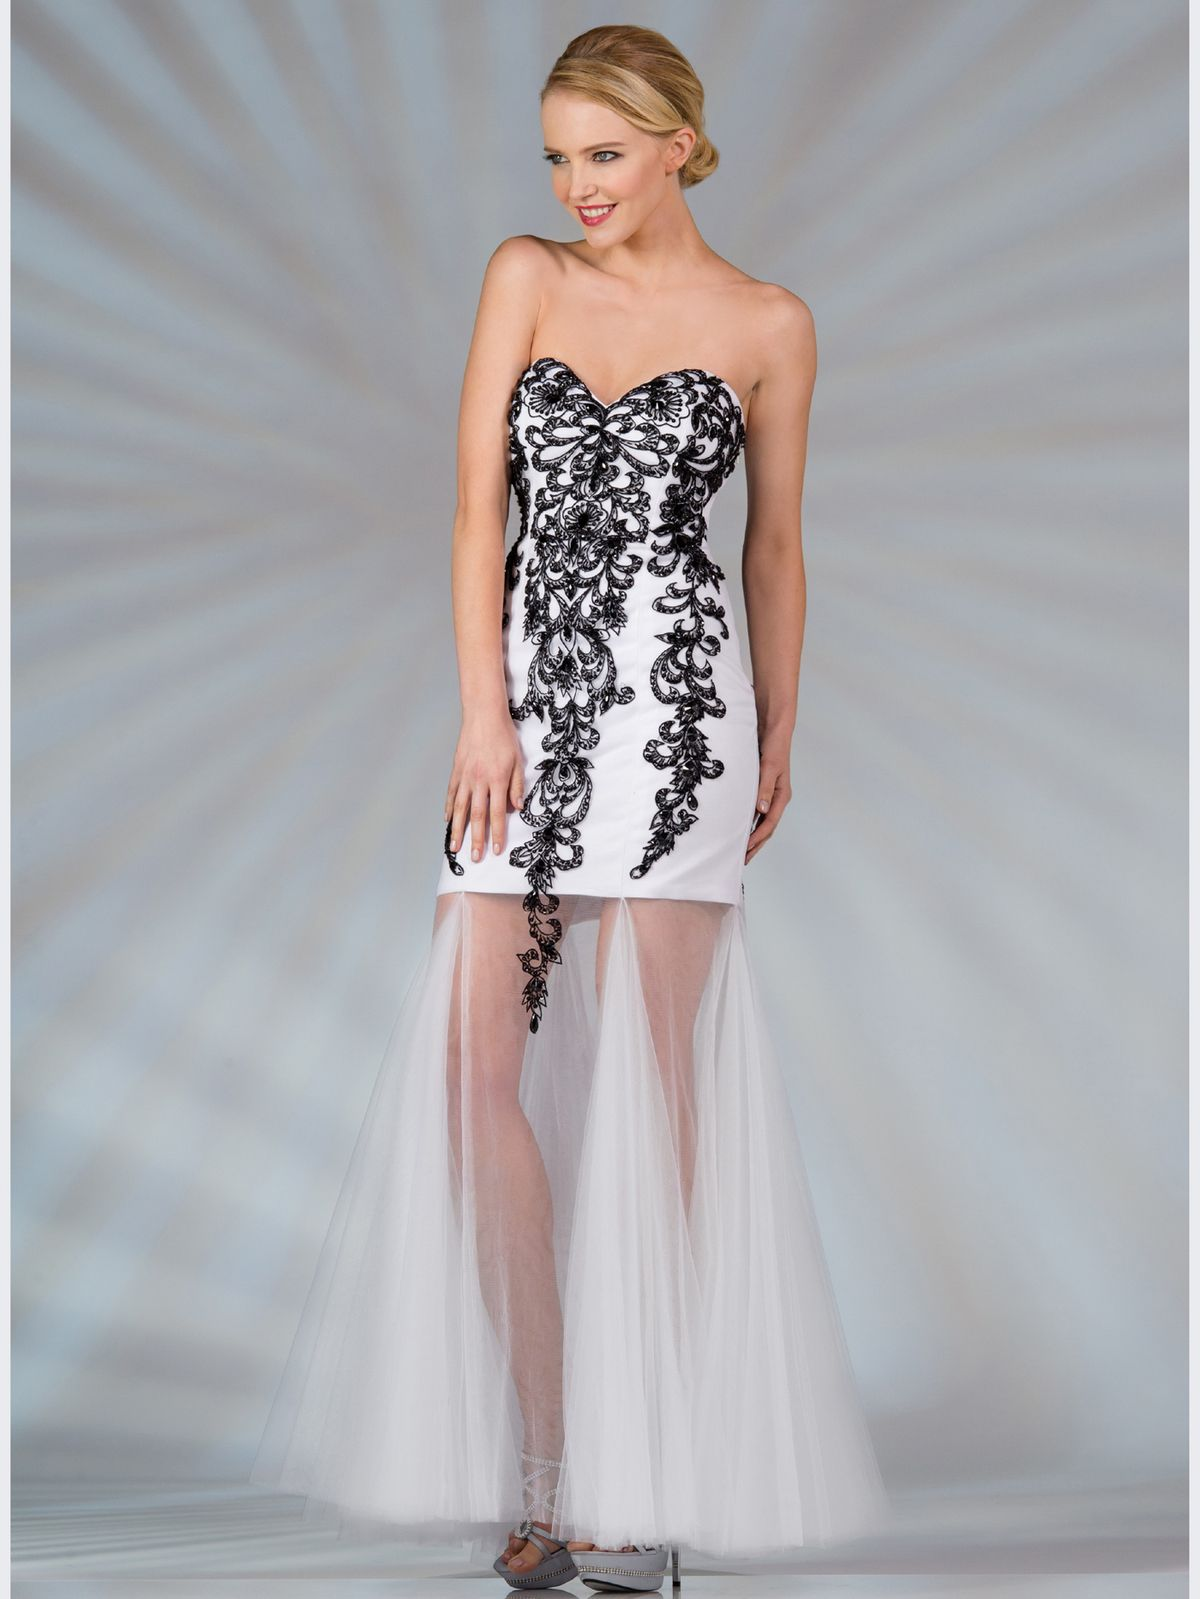 Exclusive Black and White Formal Dresses : Black White Vintage ...